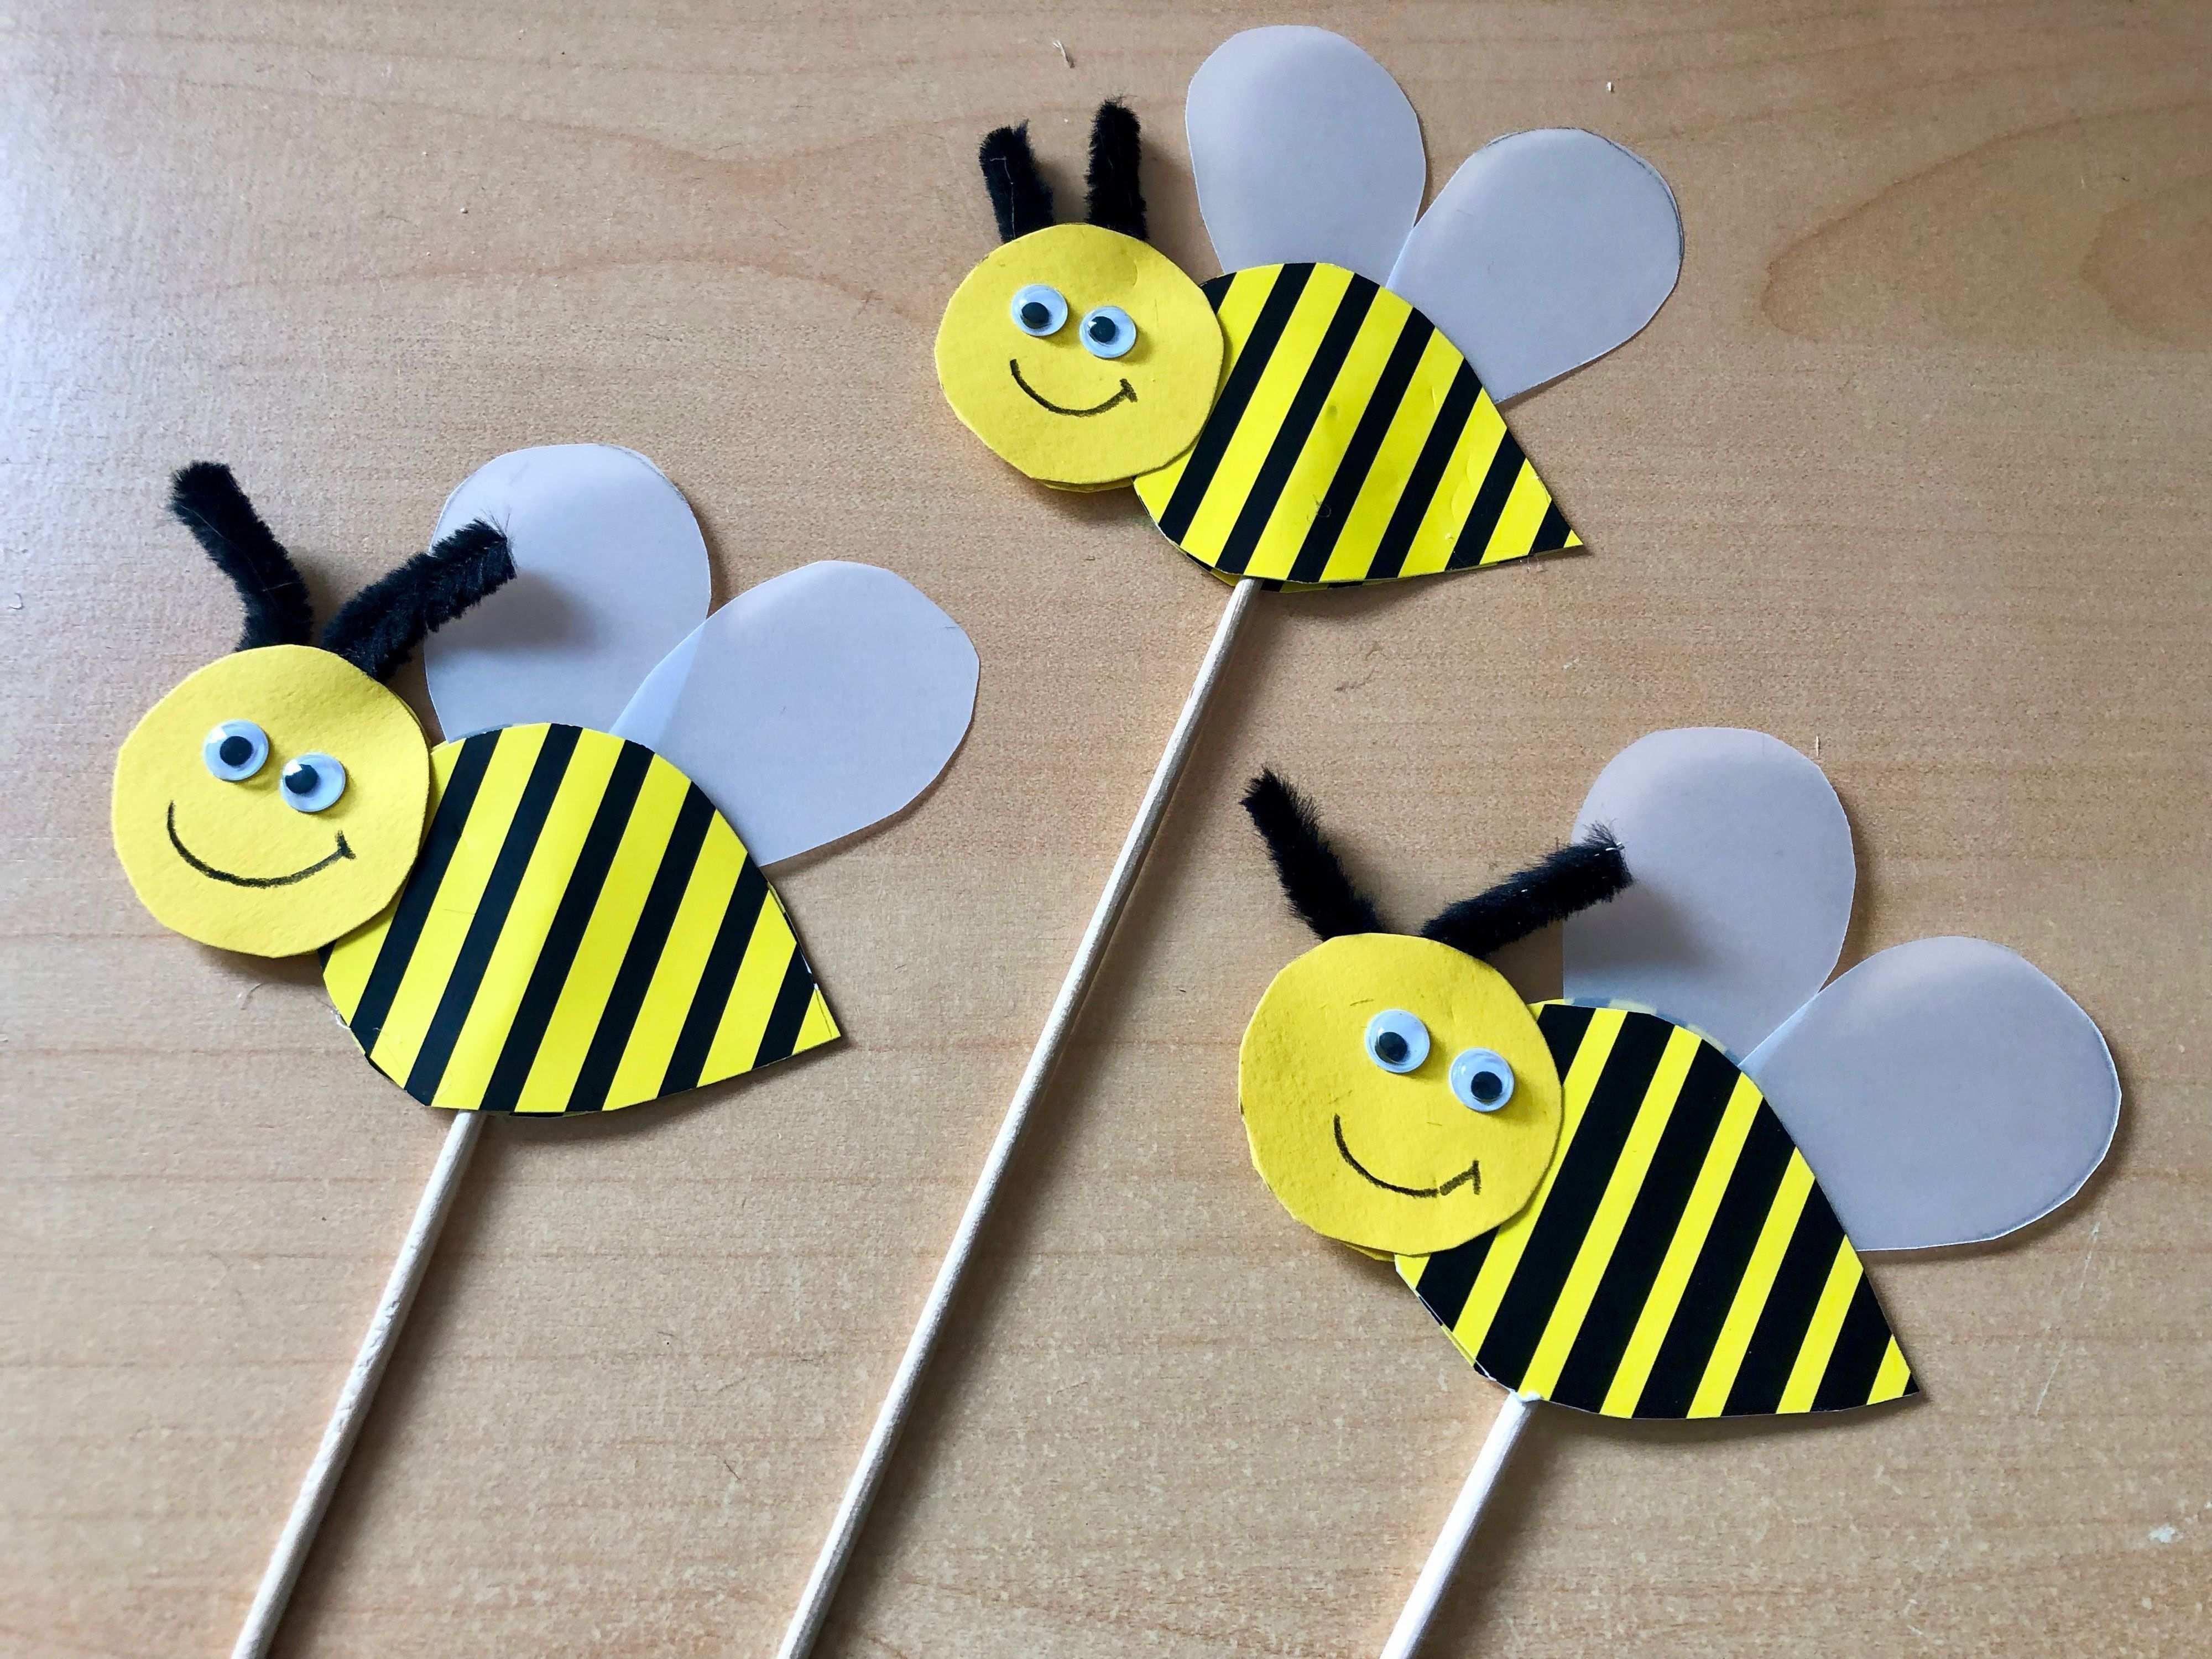 Kleine Bienchen Basteln Basteln Bienchen Kleine In 2020 Bienen Basteln Basteln Fruhling Kindergarten Basteln Fruhling Kinder